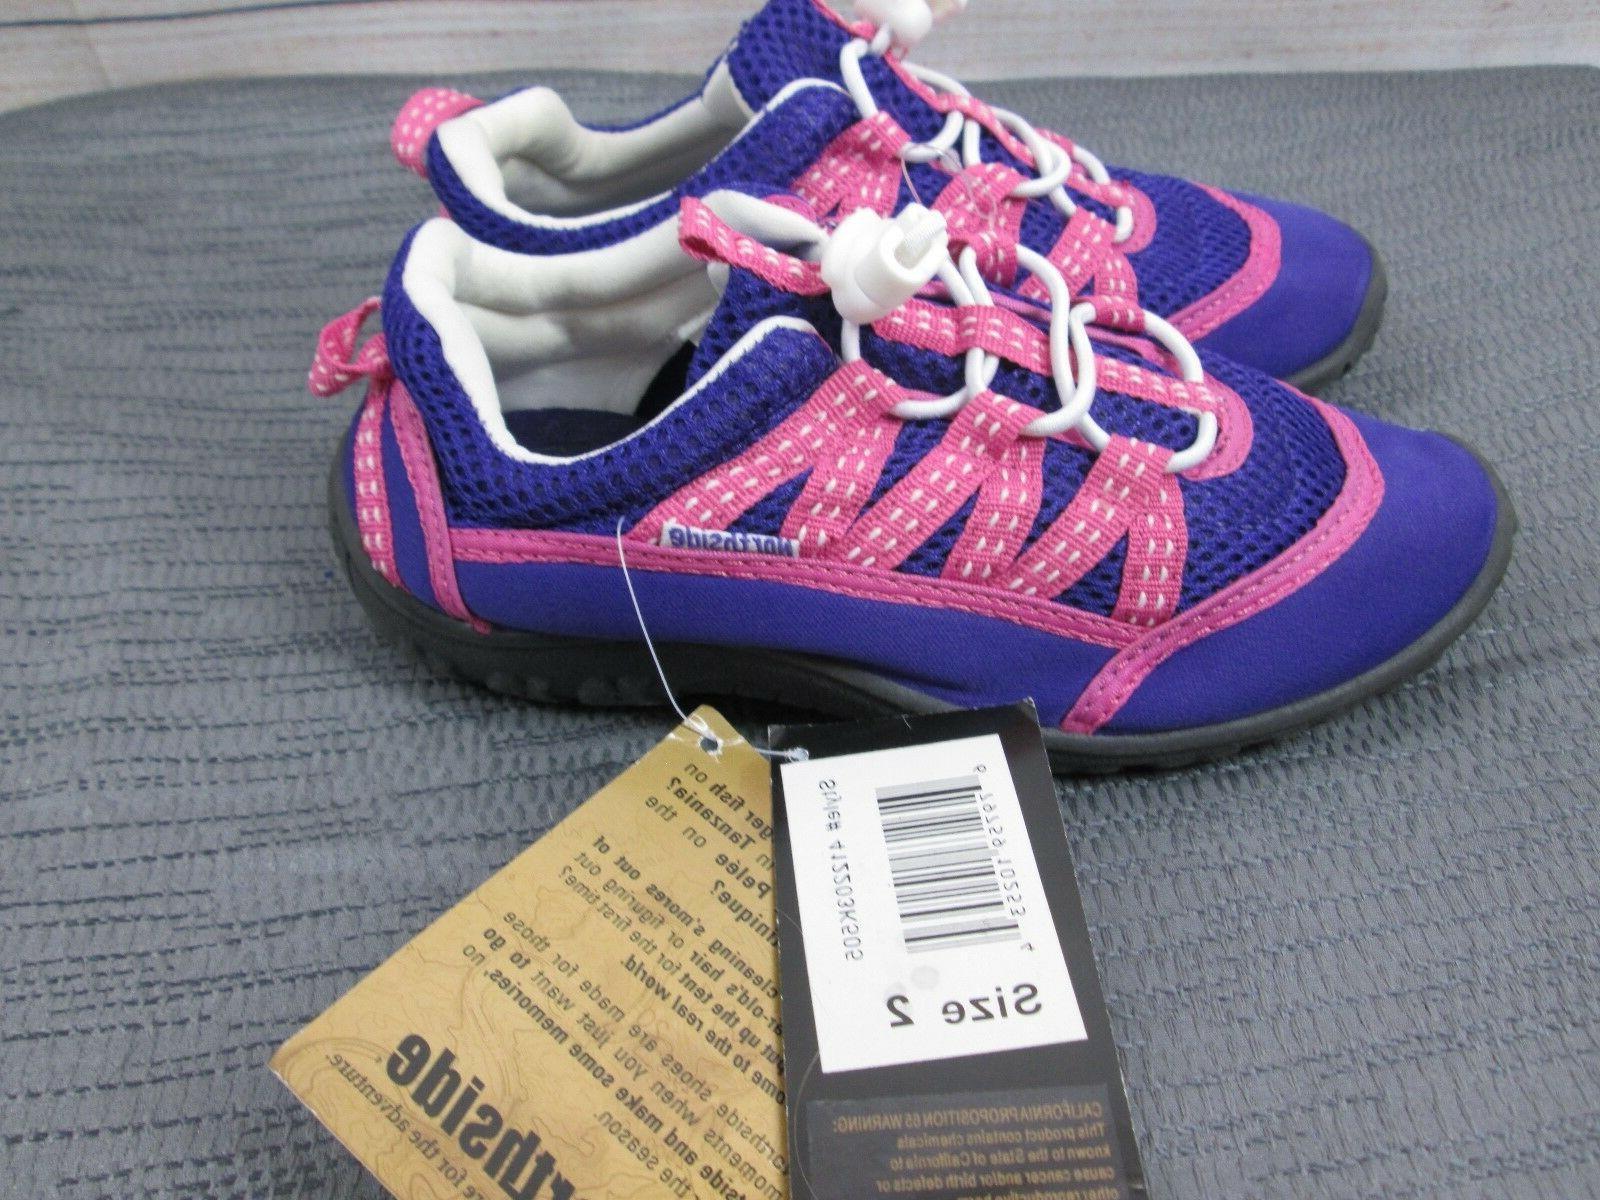 NEW Girl's Size 2 Purple Neoprene Sandals Beach Shoes